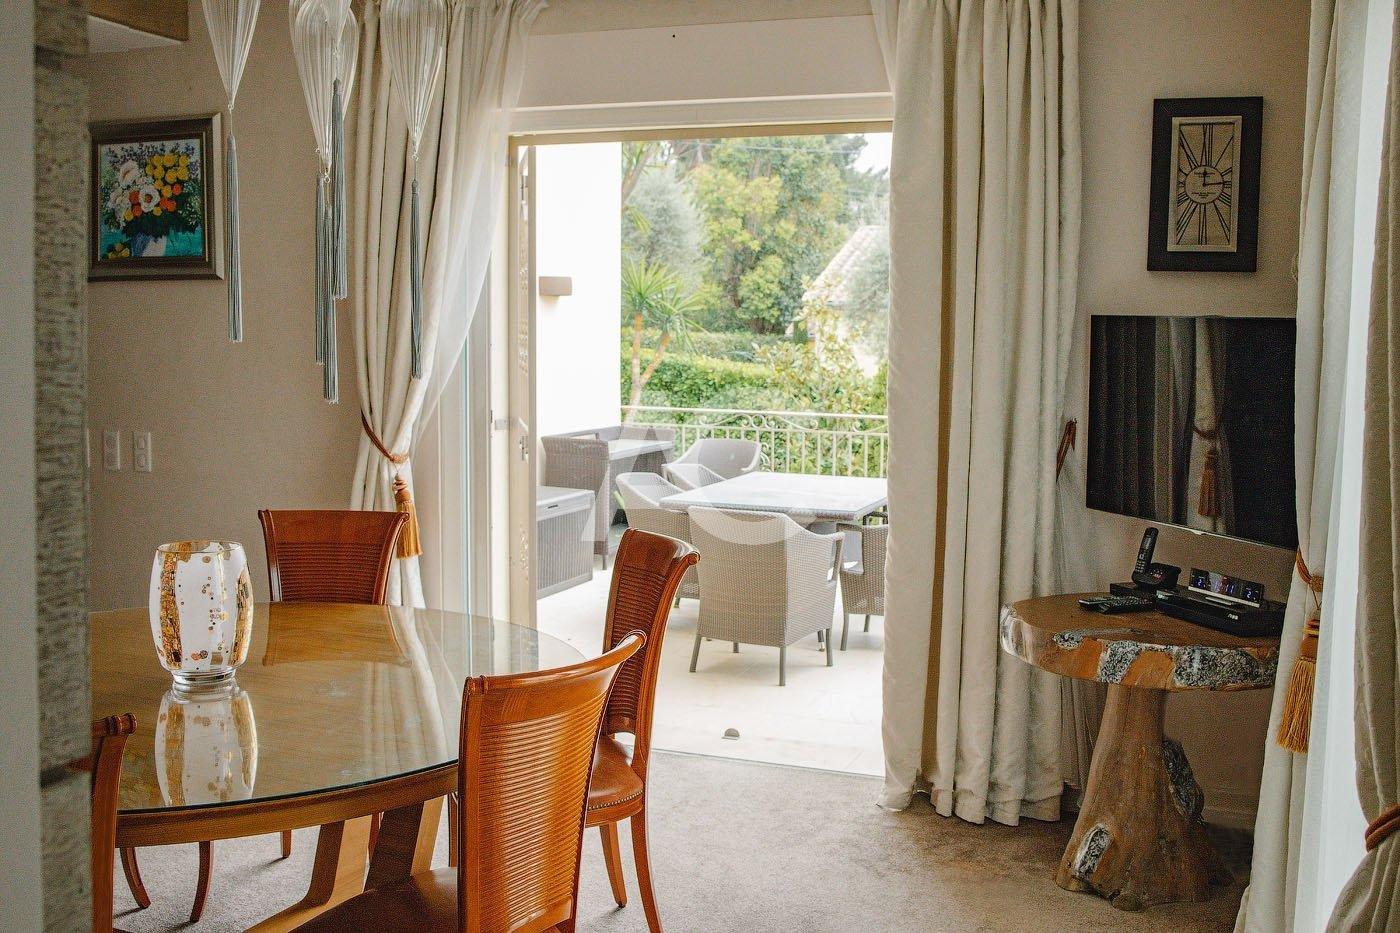 Superb villa in private domain in Cap d'Antibes